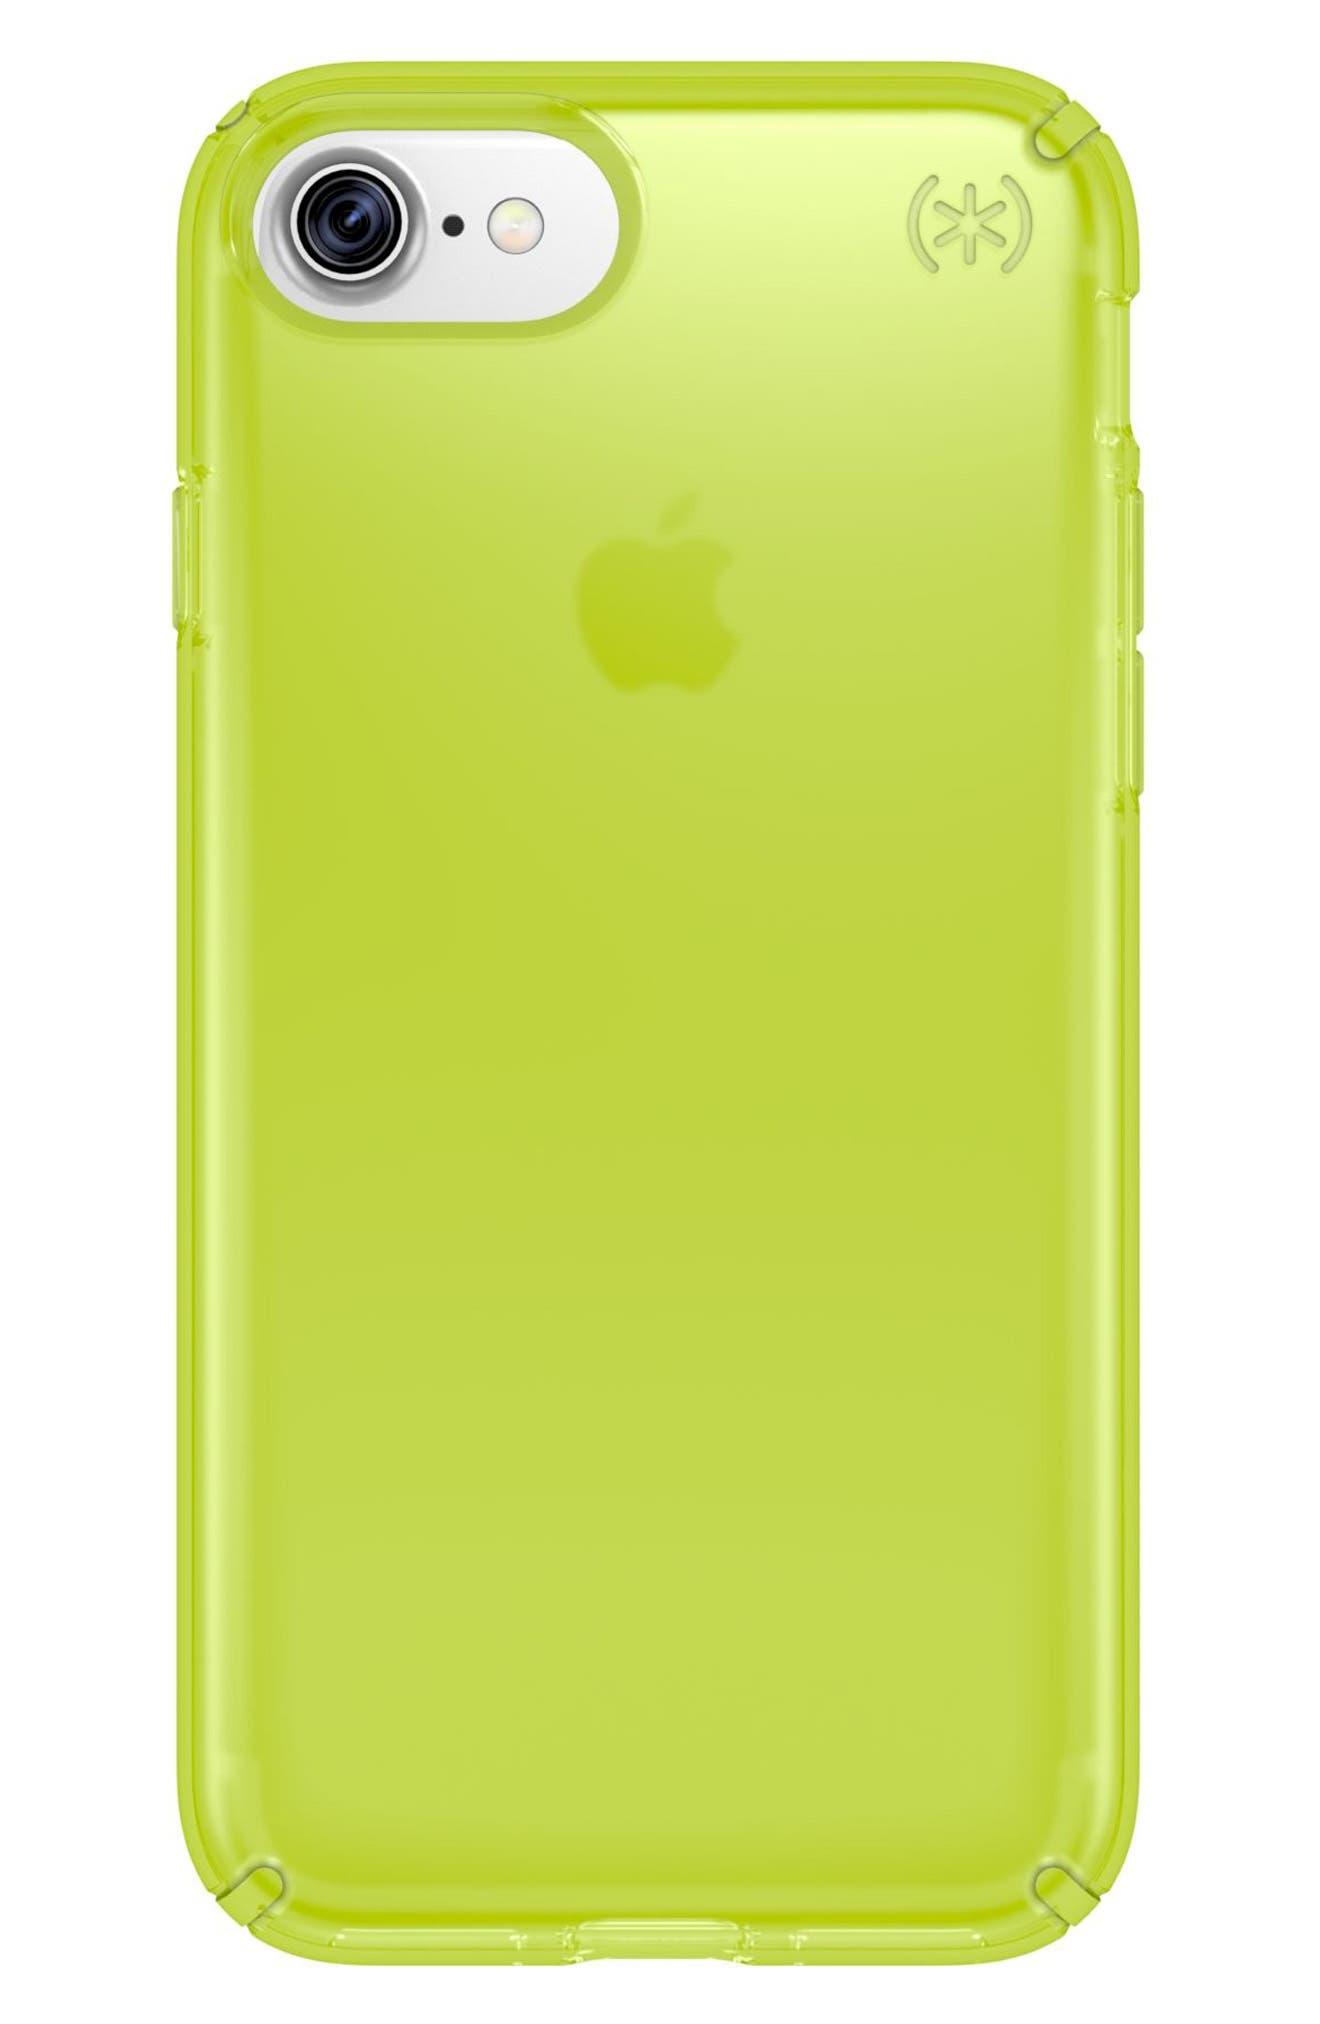 Speck Presidio Clear iPhone 6/6s/7/8 Case